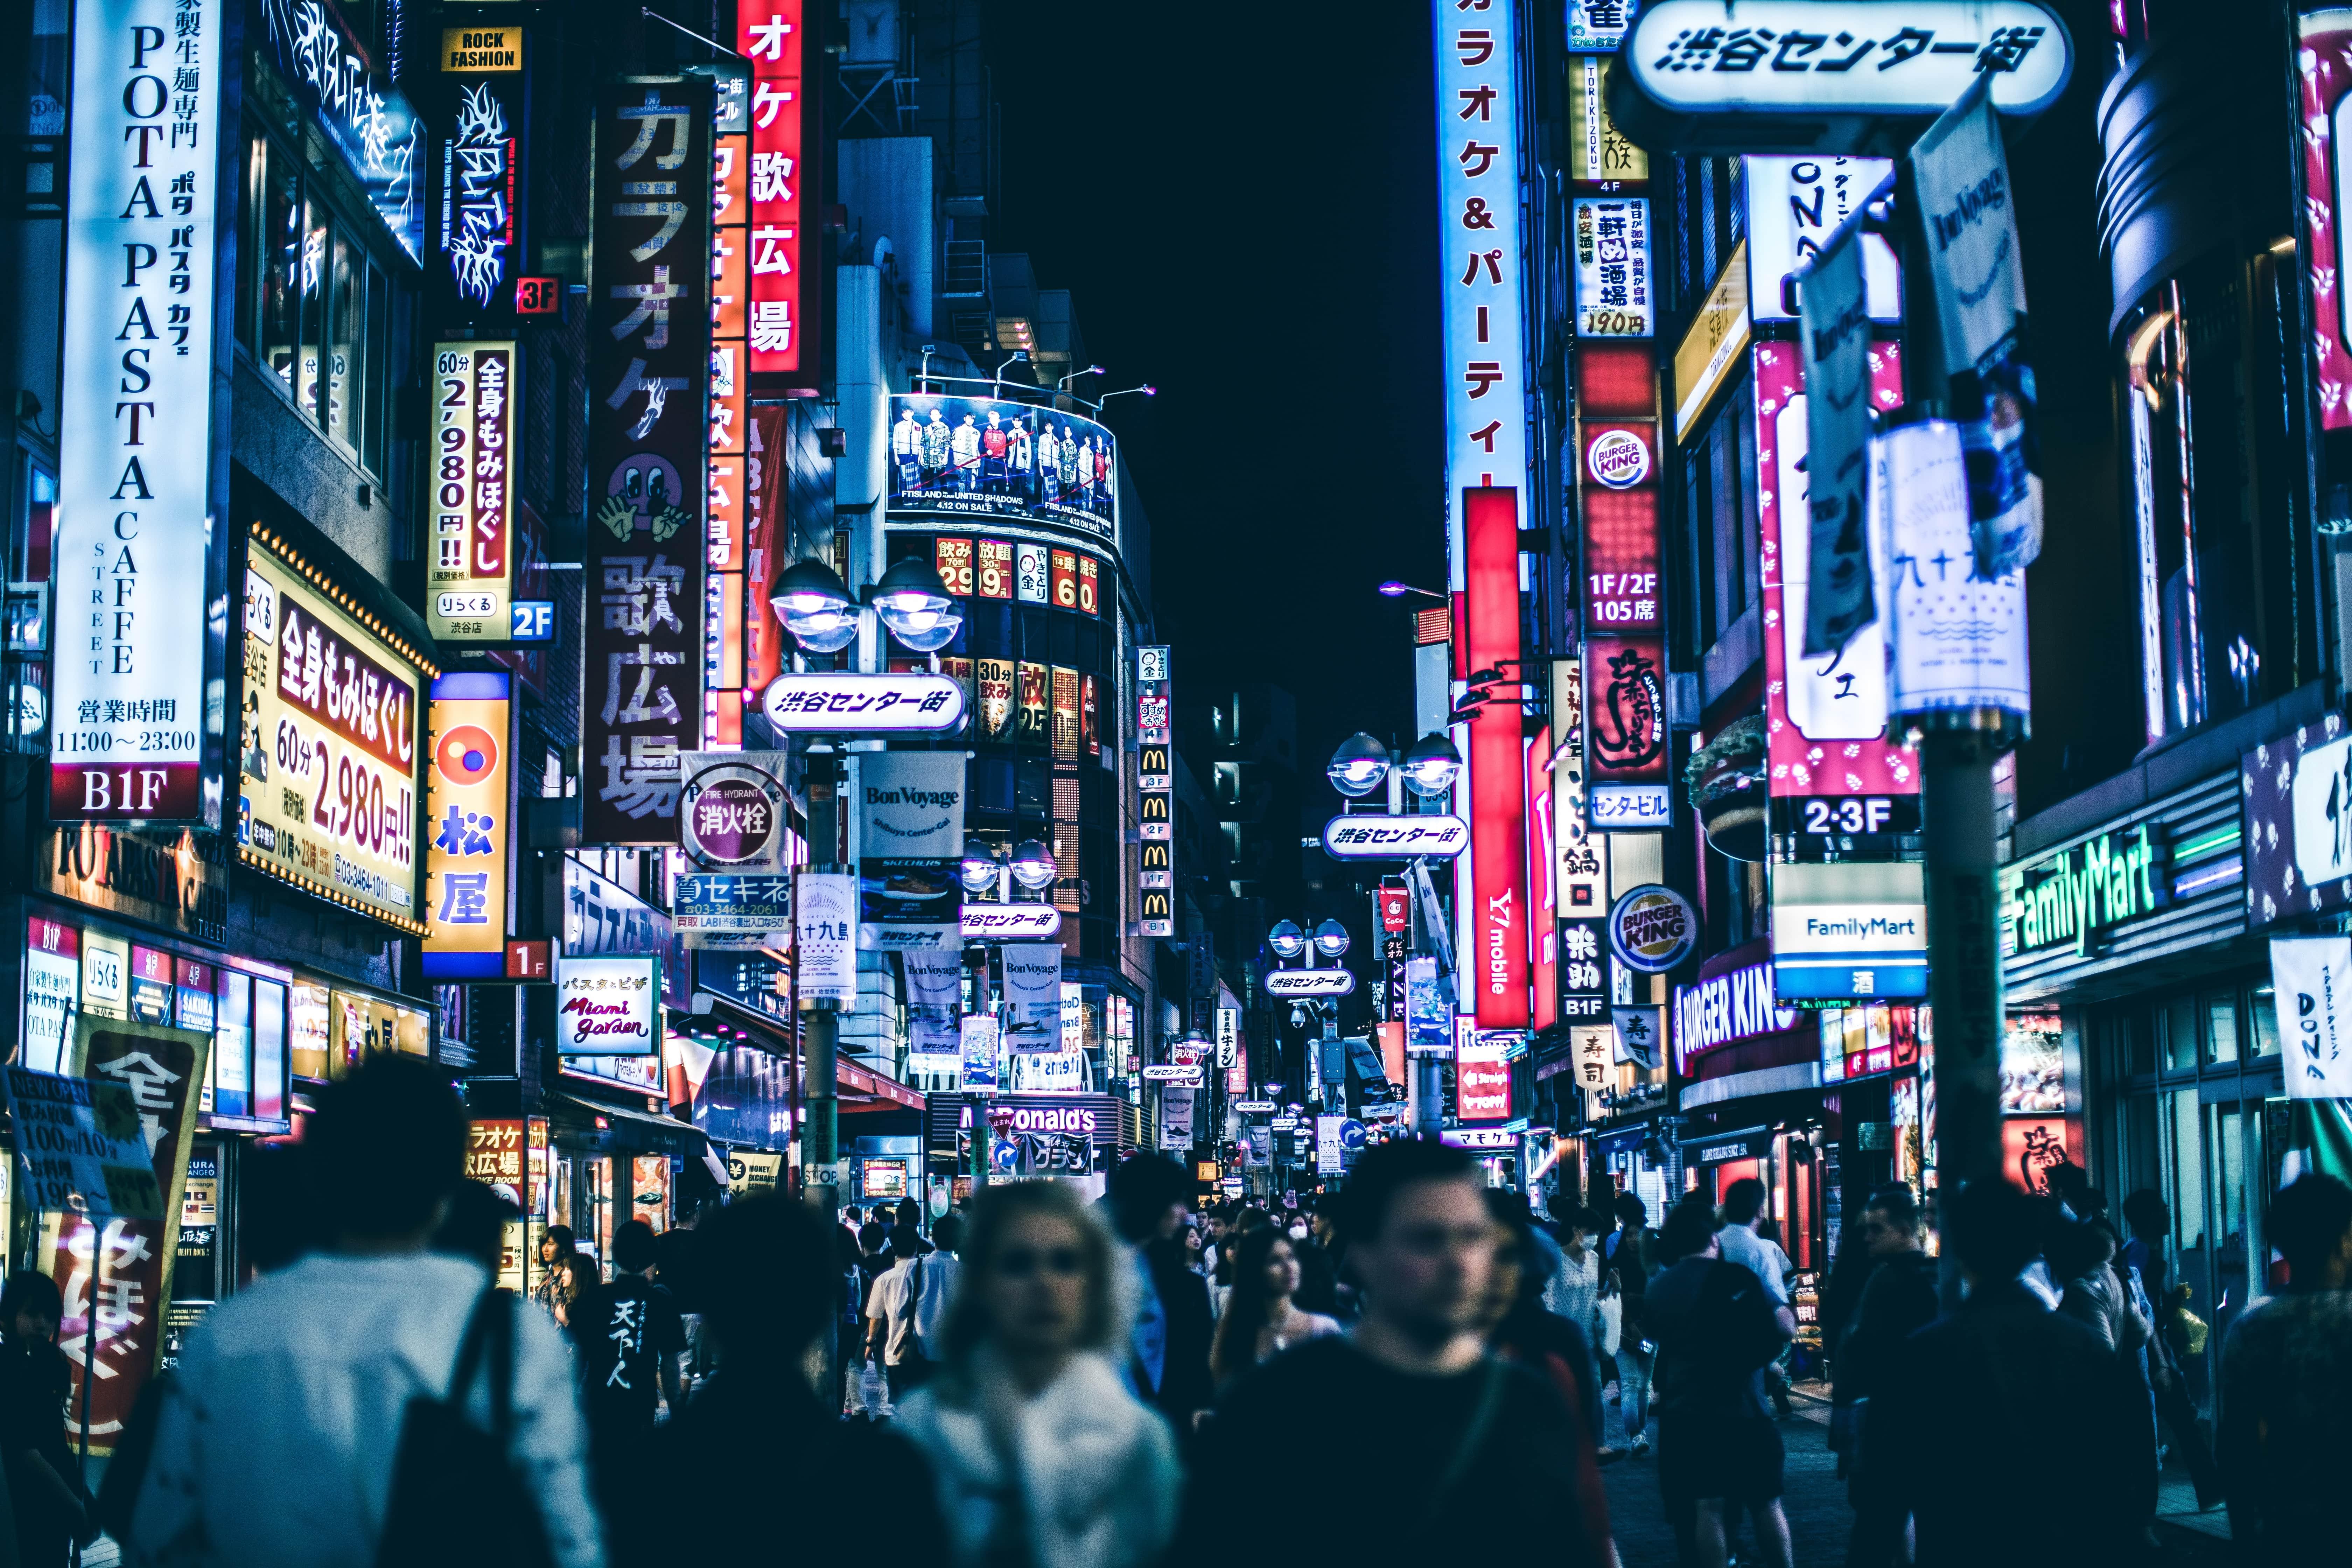 Shibuya nightlife is a veritable Tokyo point of interest